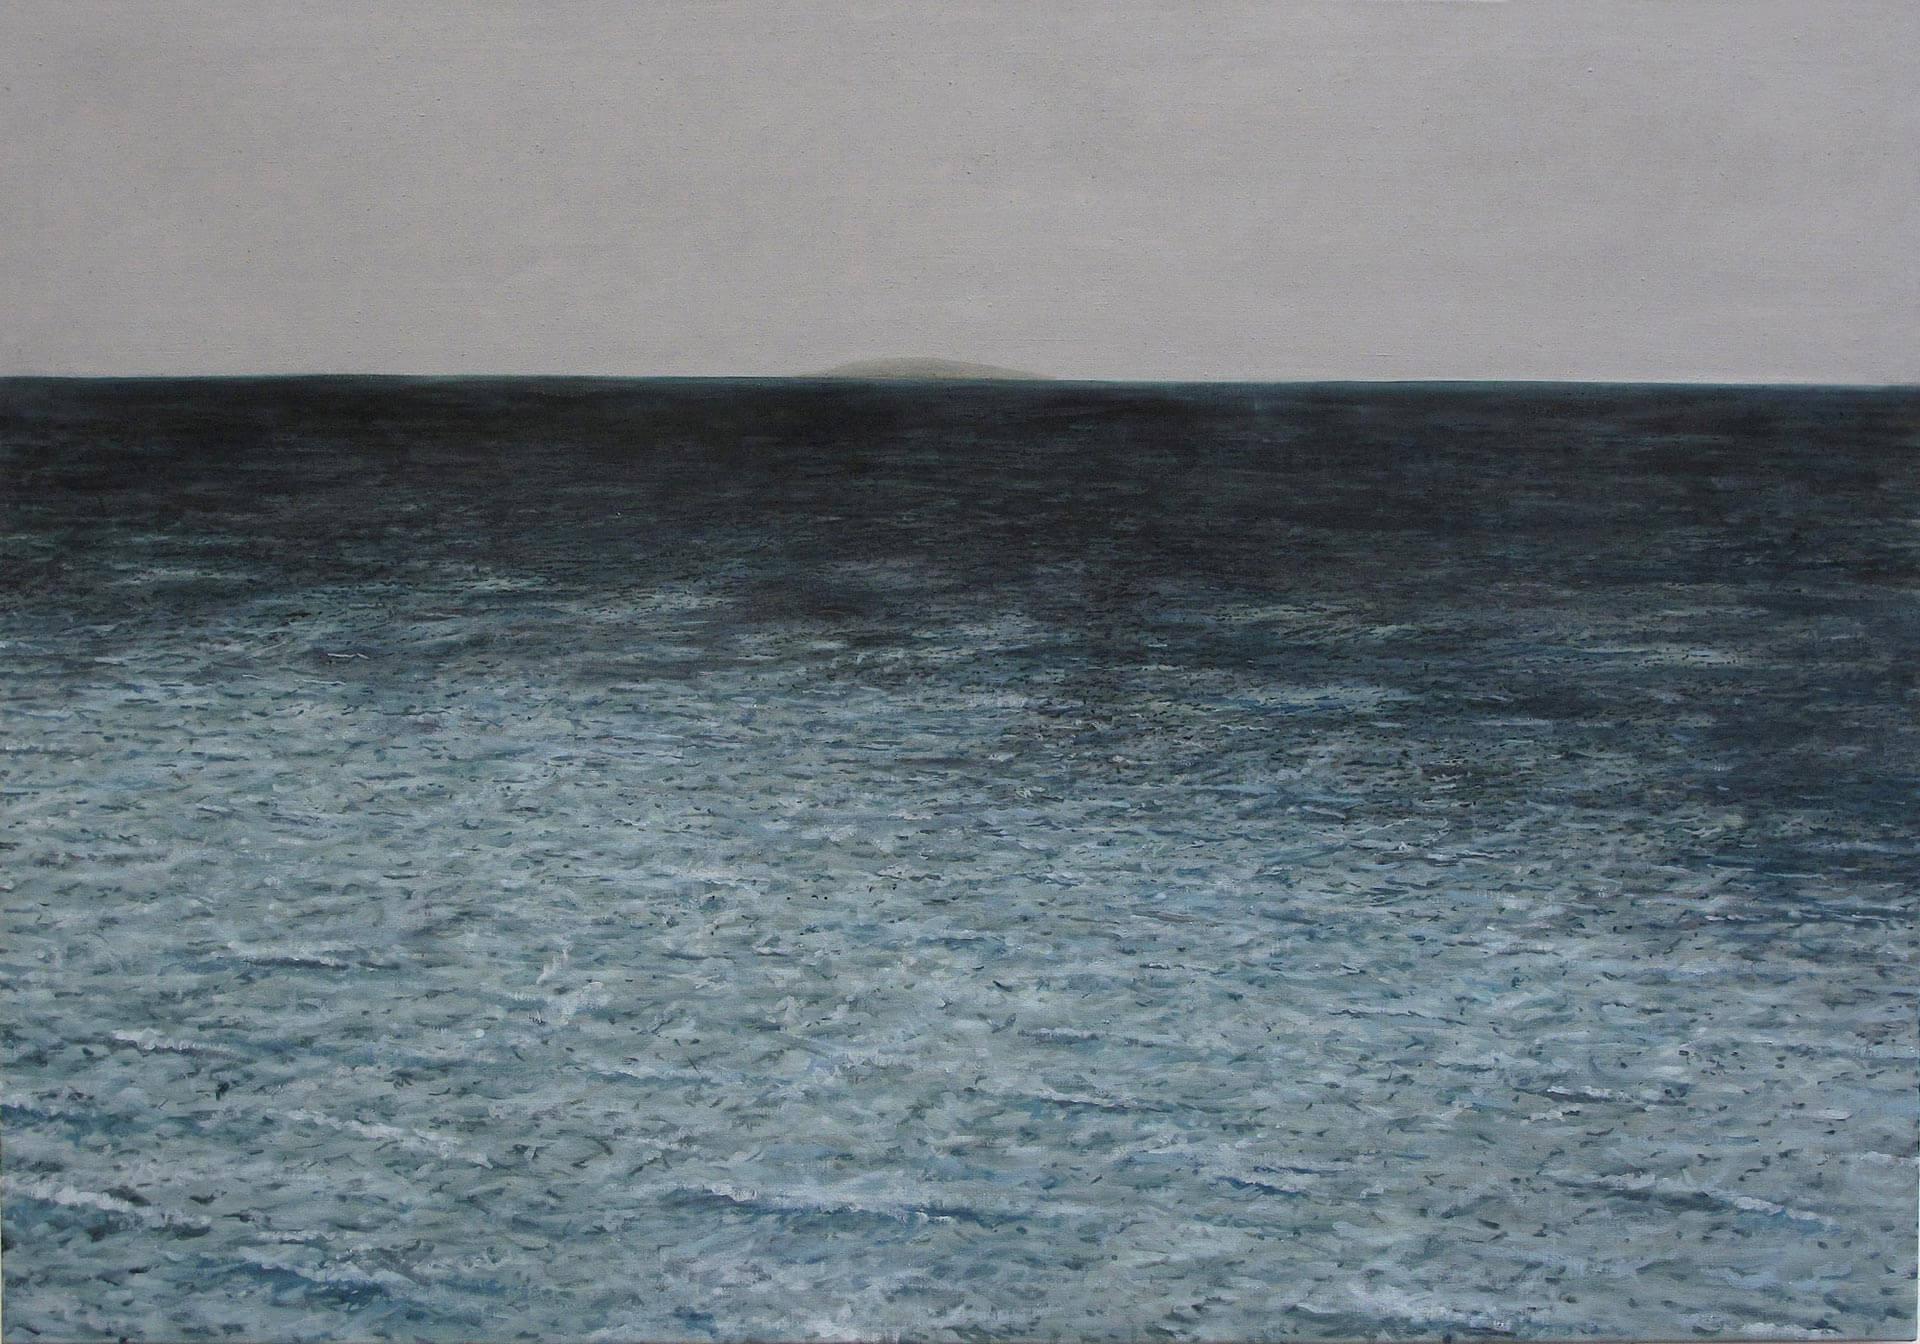 Sebastijan-Dračić-The-Island-2012-oil-on-canvas-140-x-200-cm